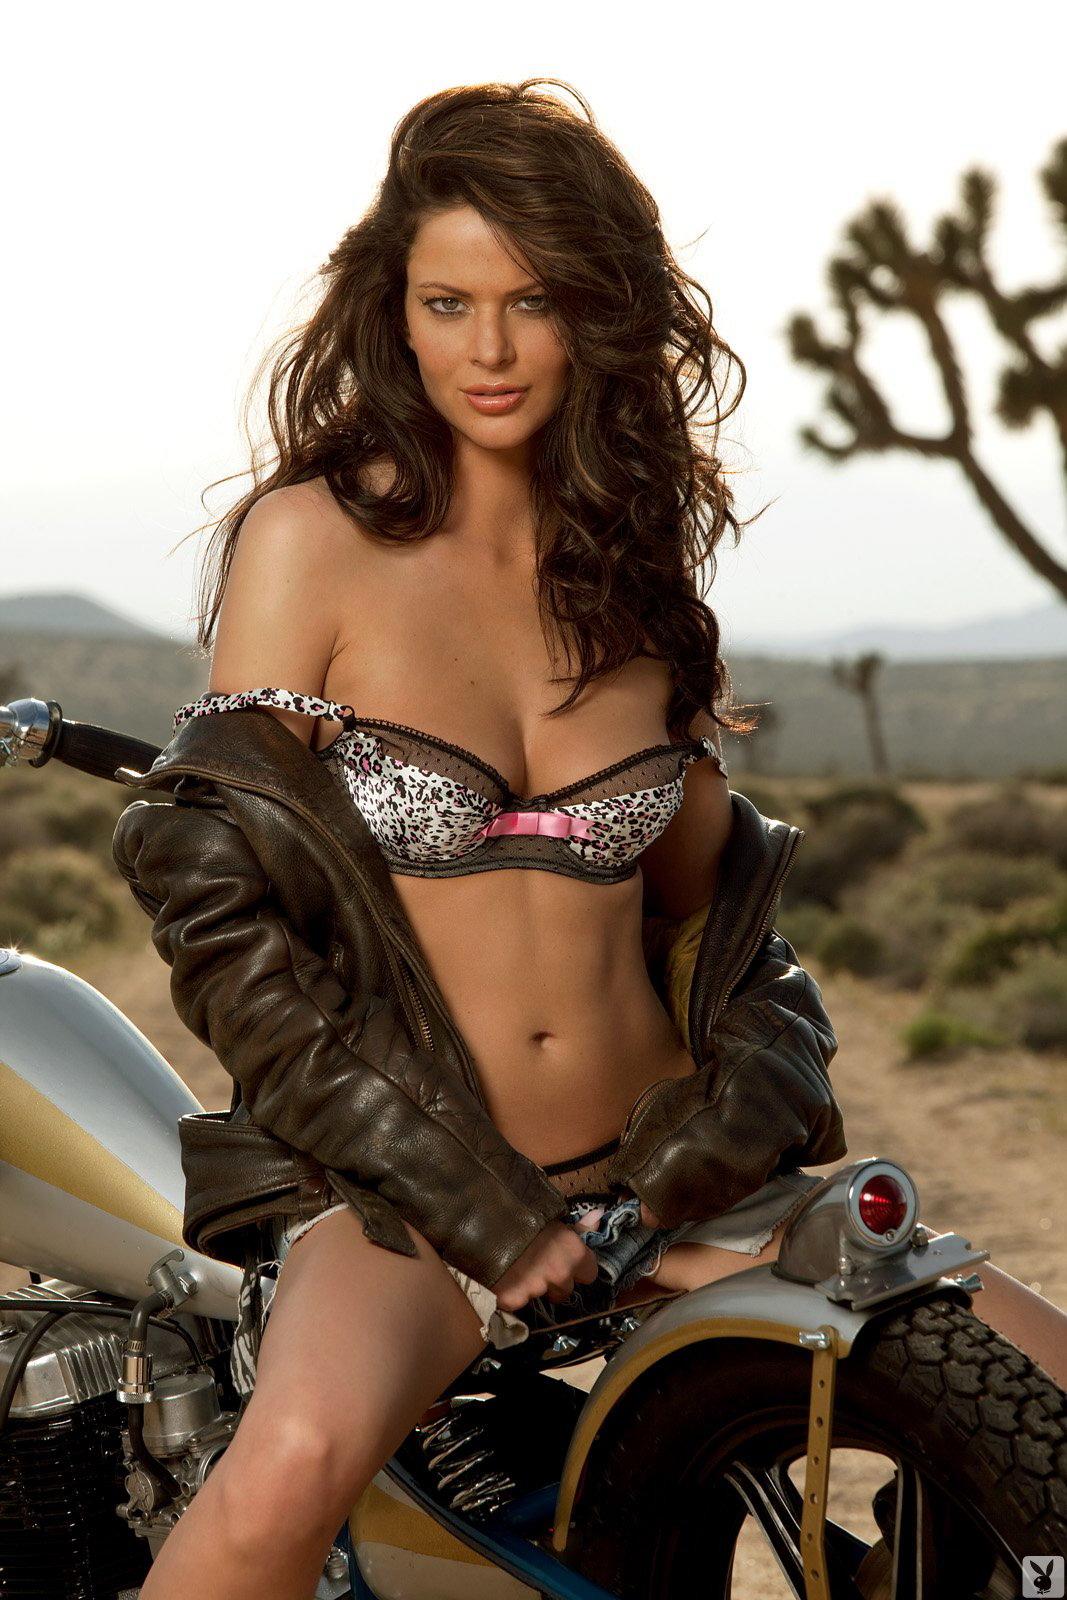 КОНКУРЕНЦИЈА - Page 3 Bsa-girl-motorbike-motographite-4